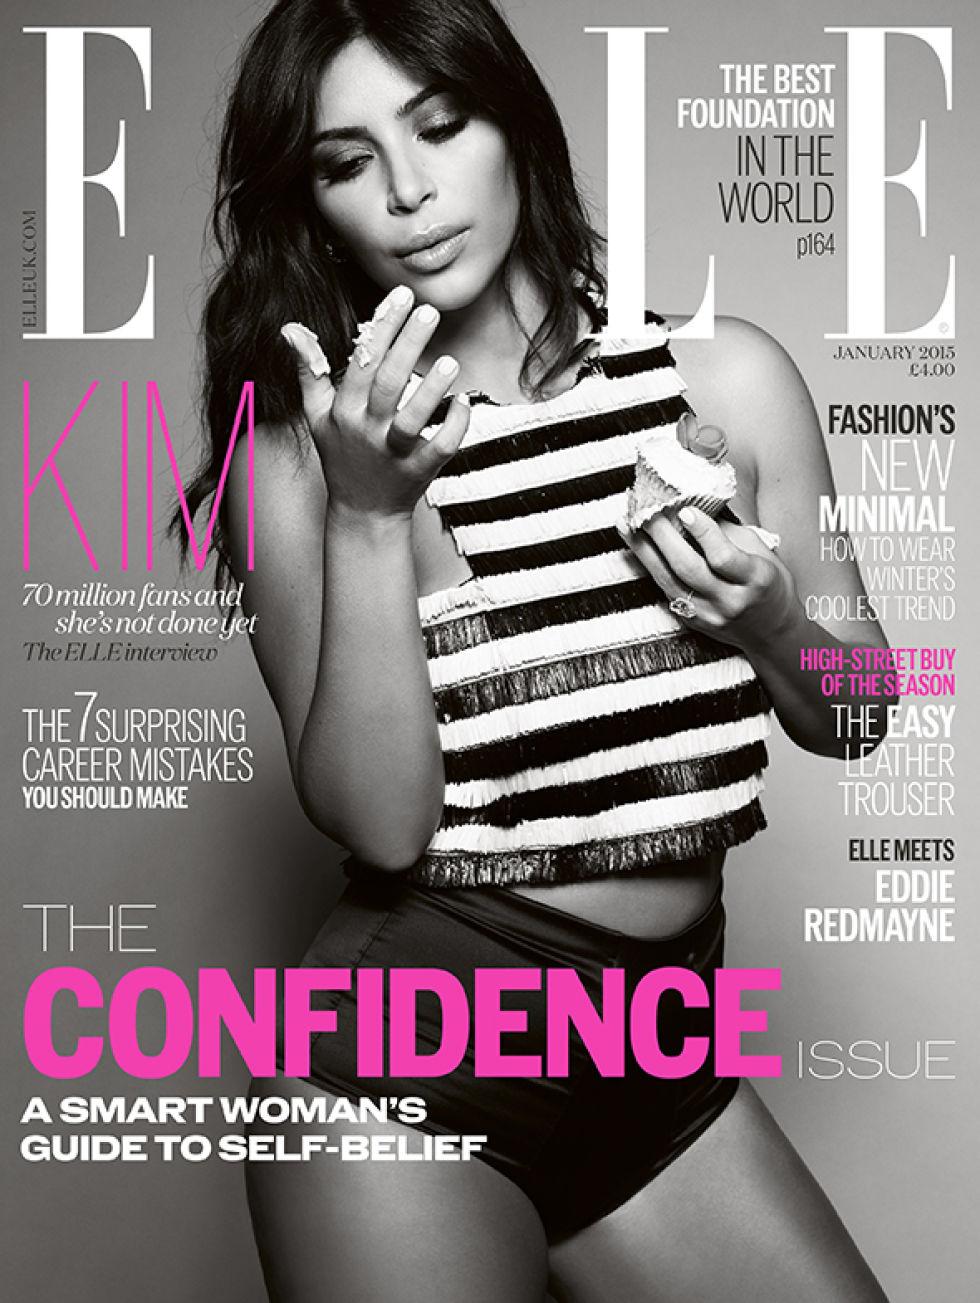 Kim-Kardashian-Elle-cupcake-1417013952